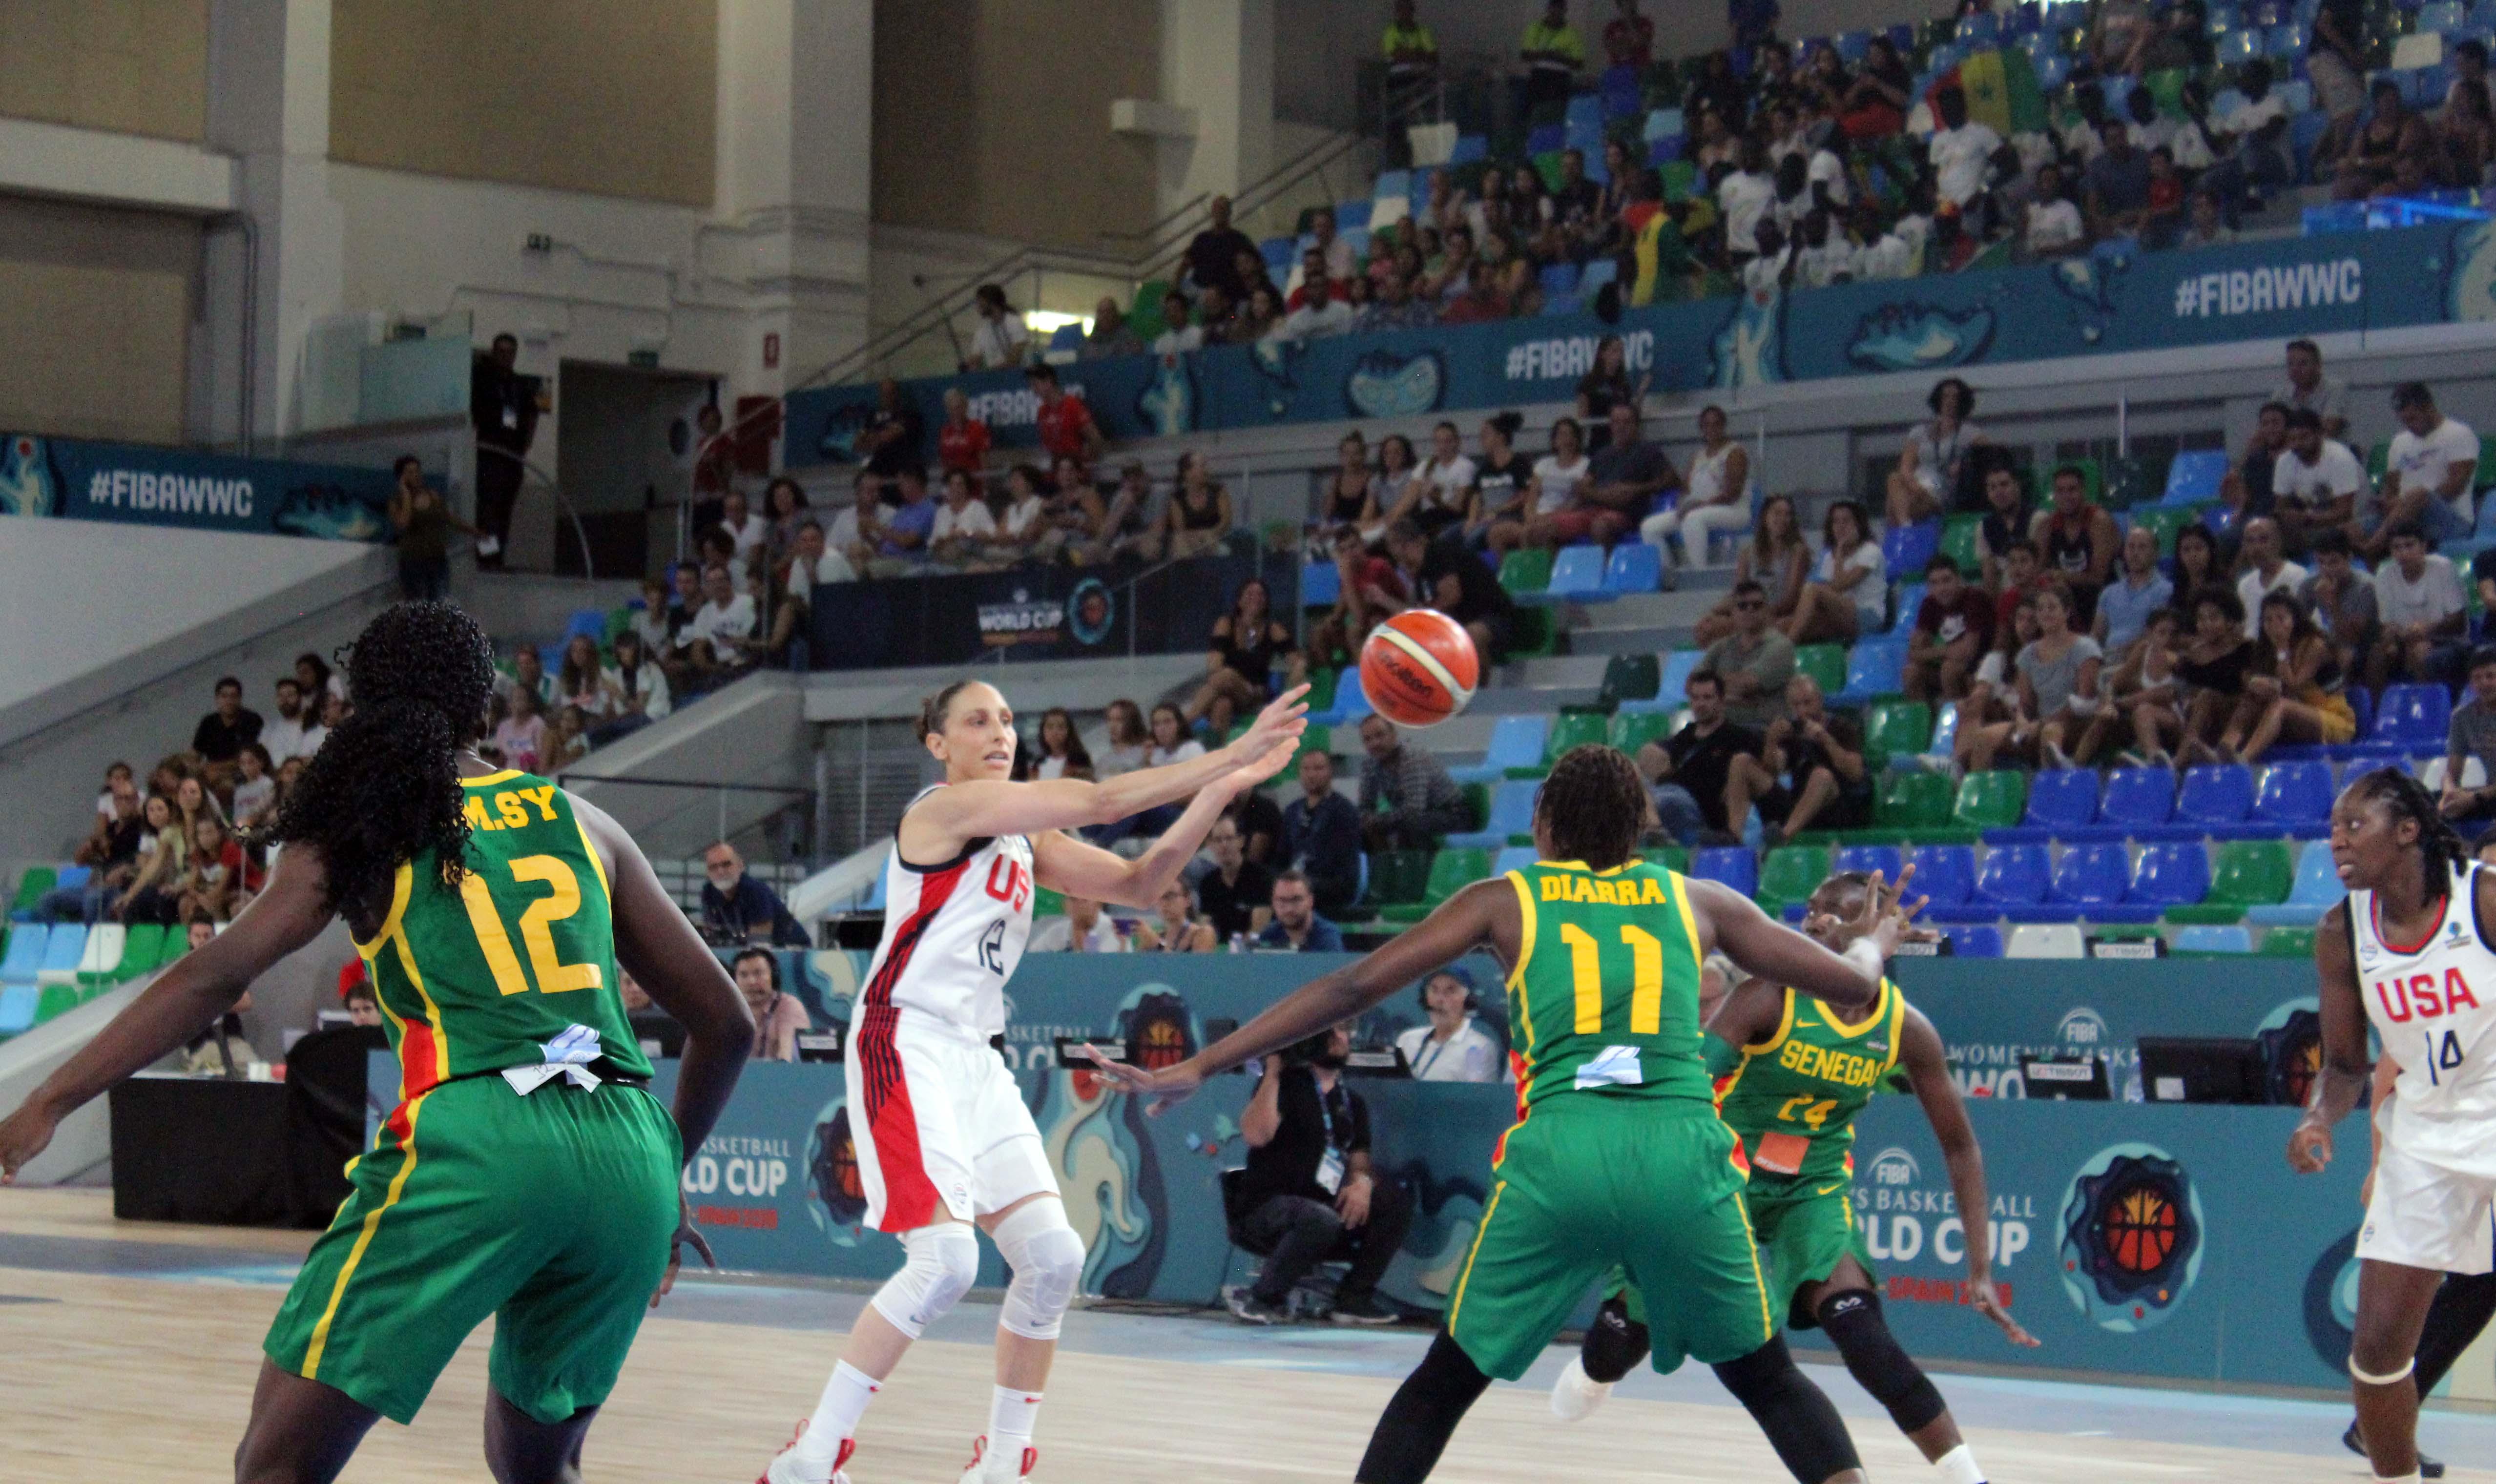 USA tops tough Senegal in FIBA World Cup opener, 87-67